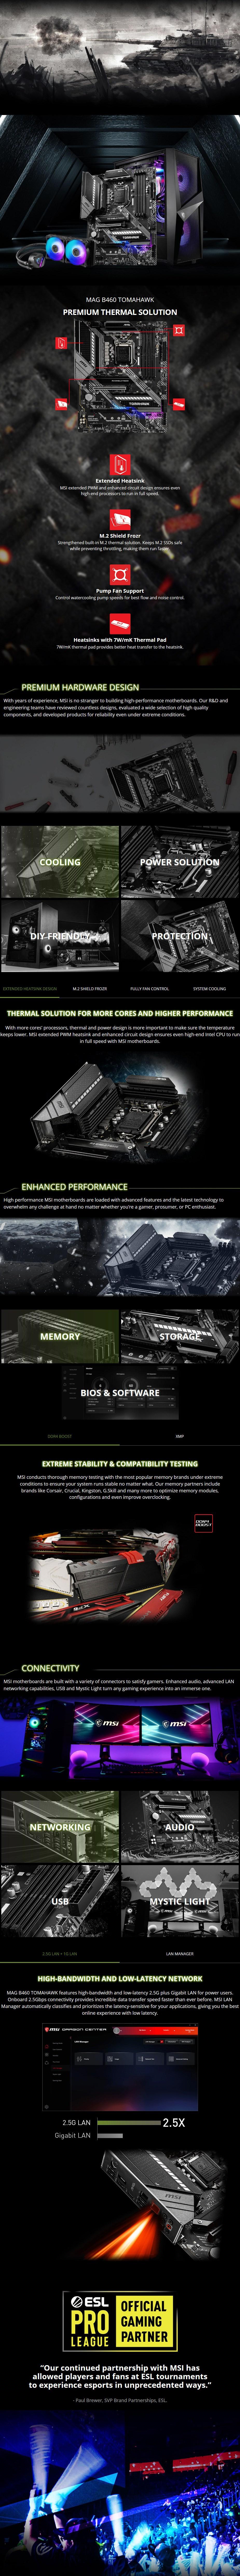 MSI MAG B460 TOMAHAWK LGA 1200 ATX Motherboard - Overview 1